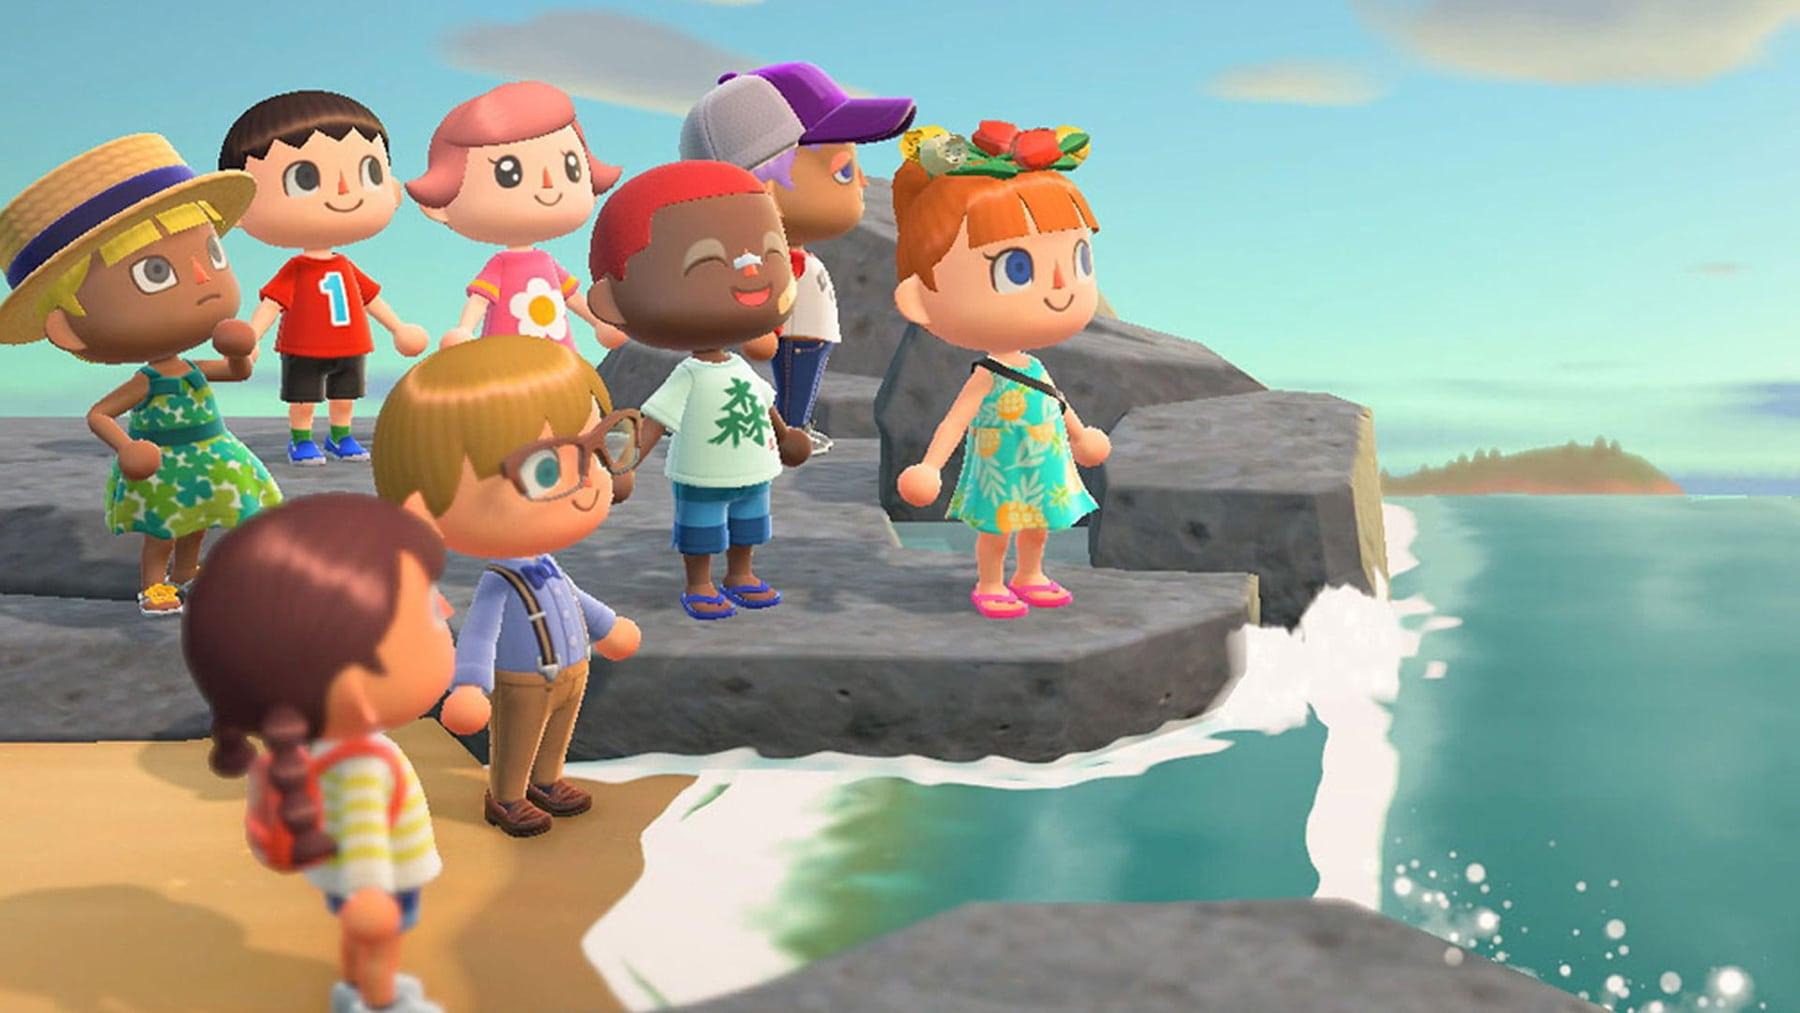 Villager Hobbies in Animal Crossing New Horizons